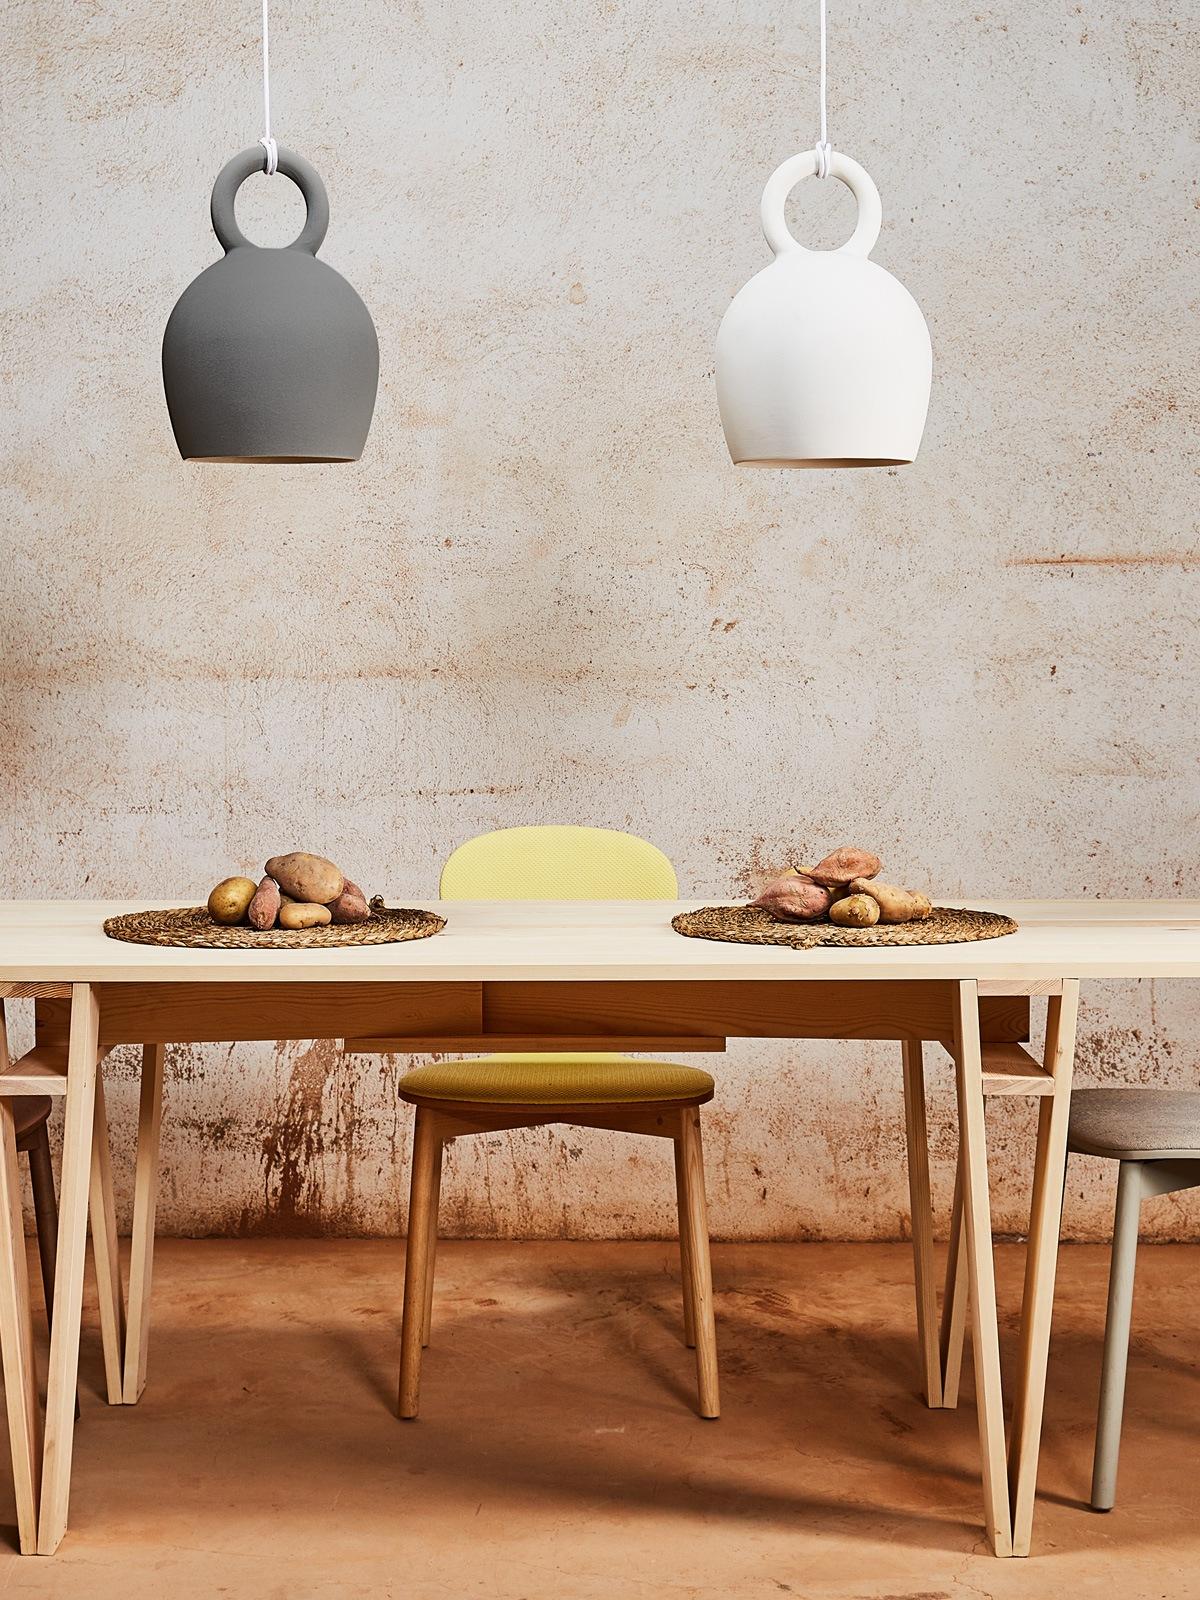 DesignOrt Blog: Calo 30 Tischleuchte Keramik Designort Berlin Lampenladen